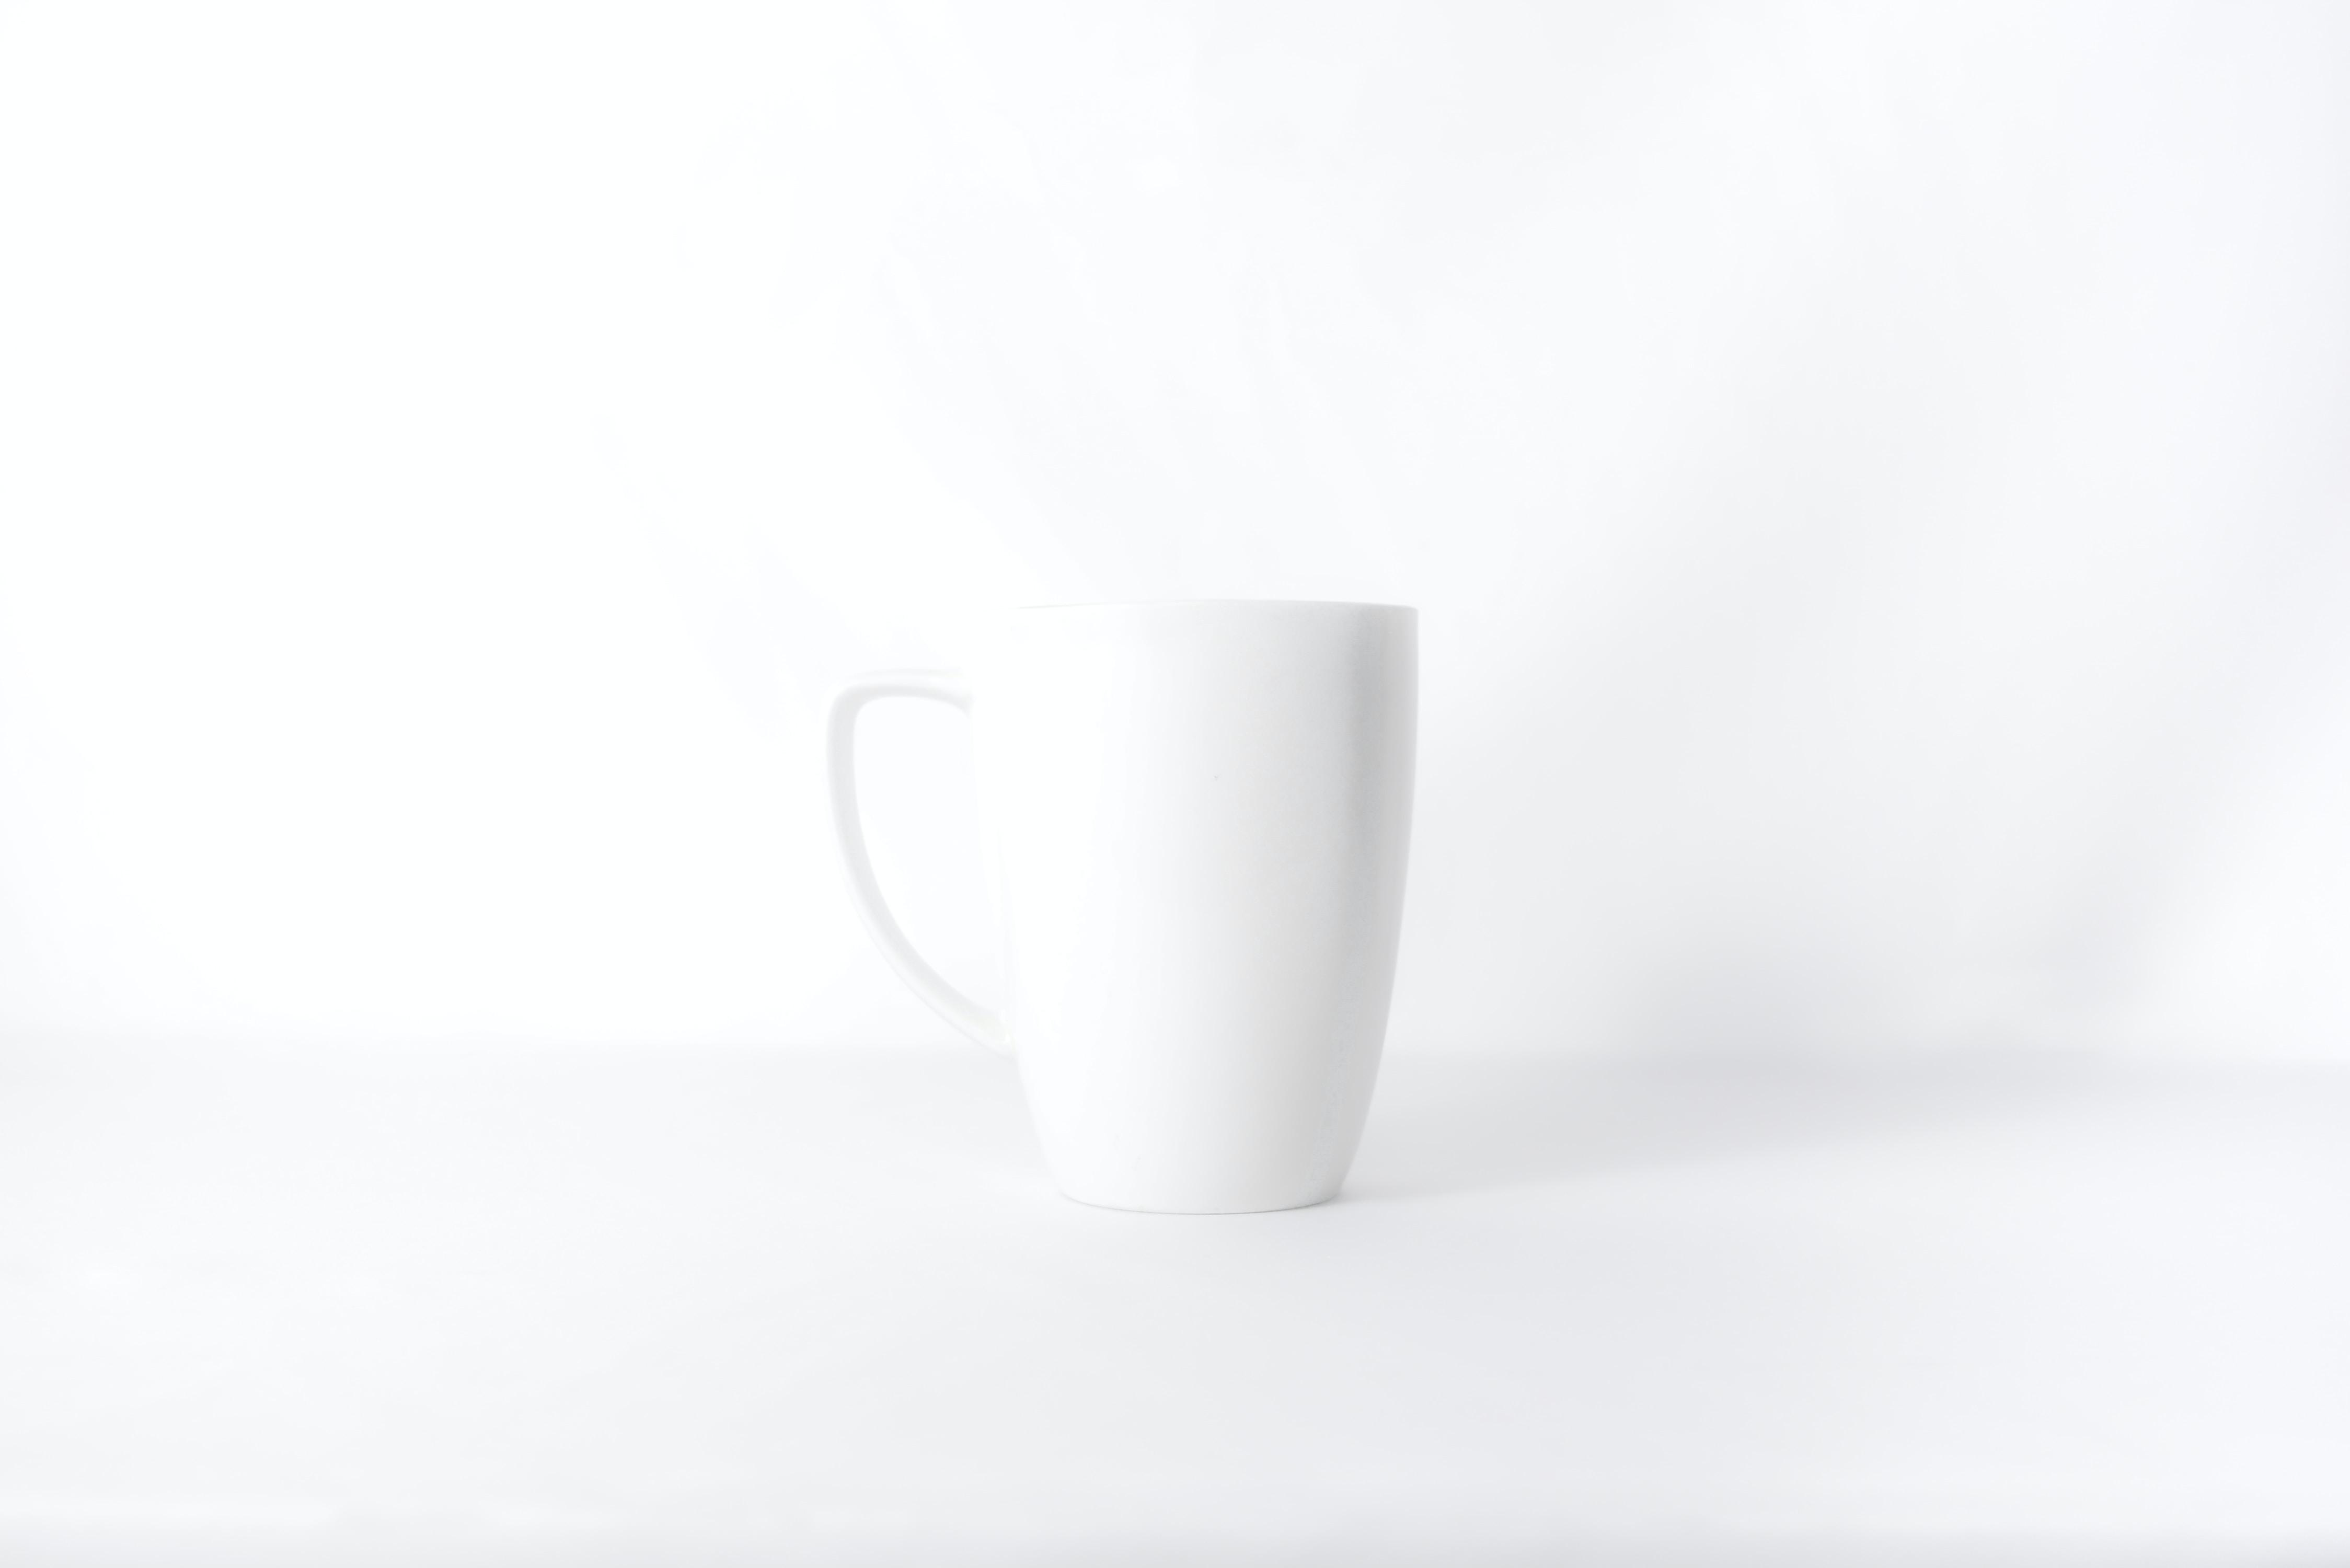 white mug against white background